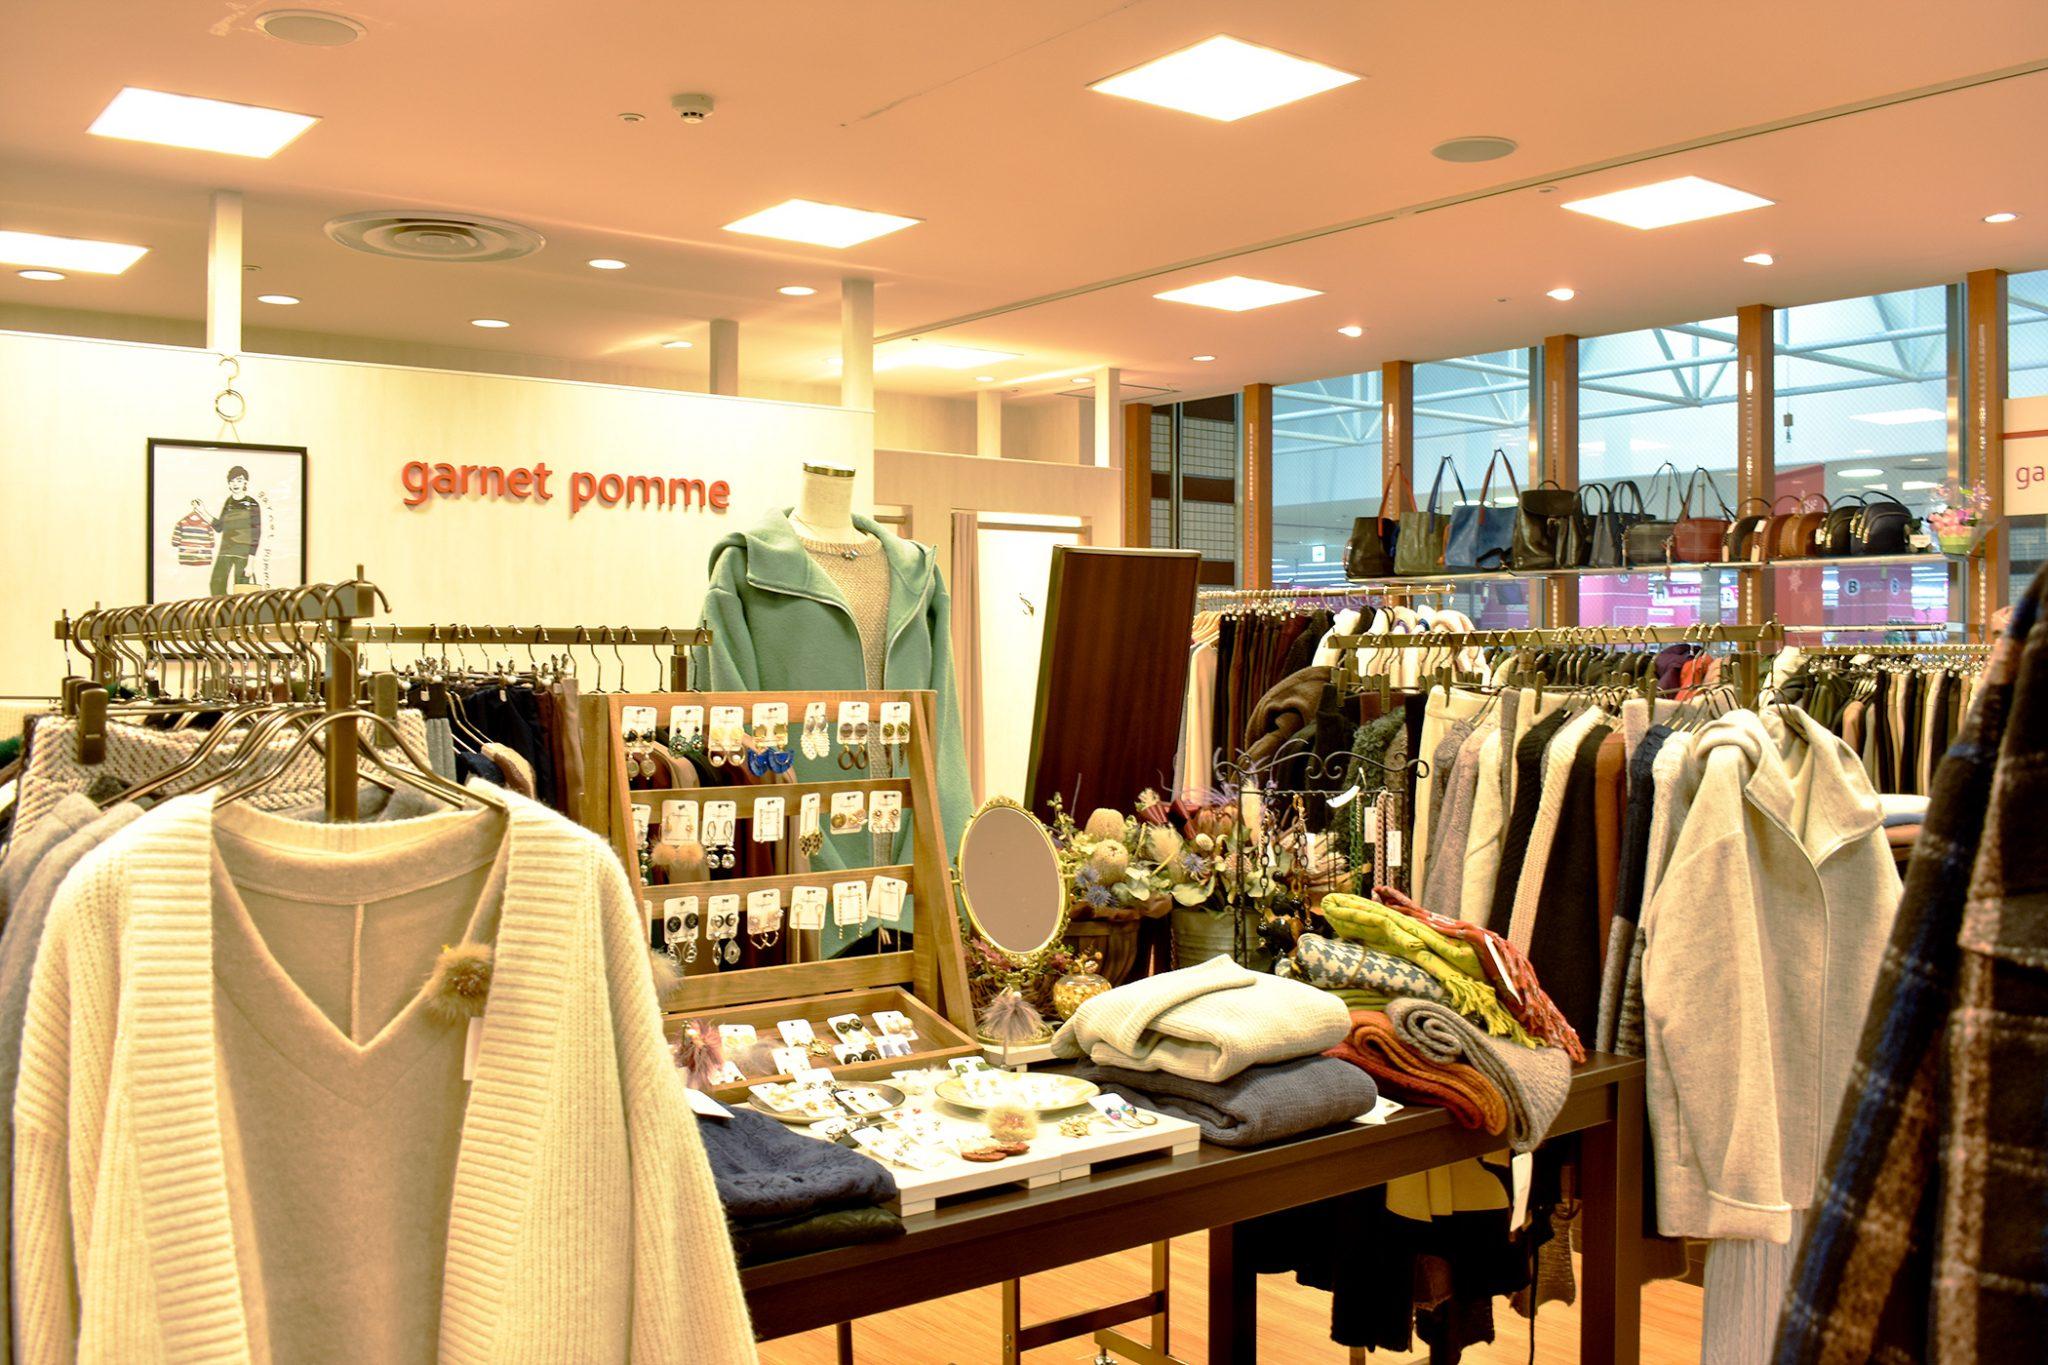 garnet pomme ガーネットポム 店内2